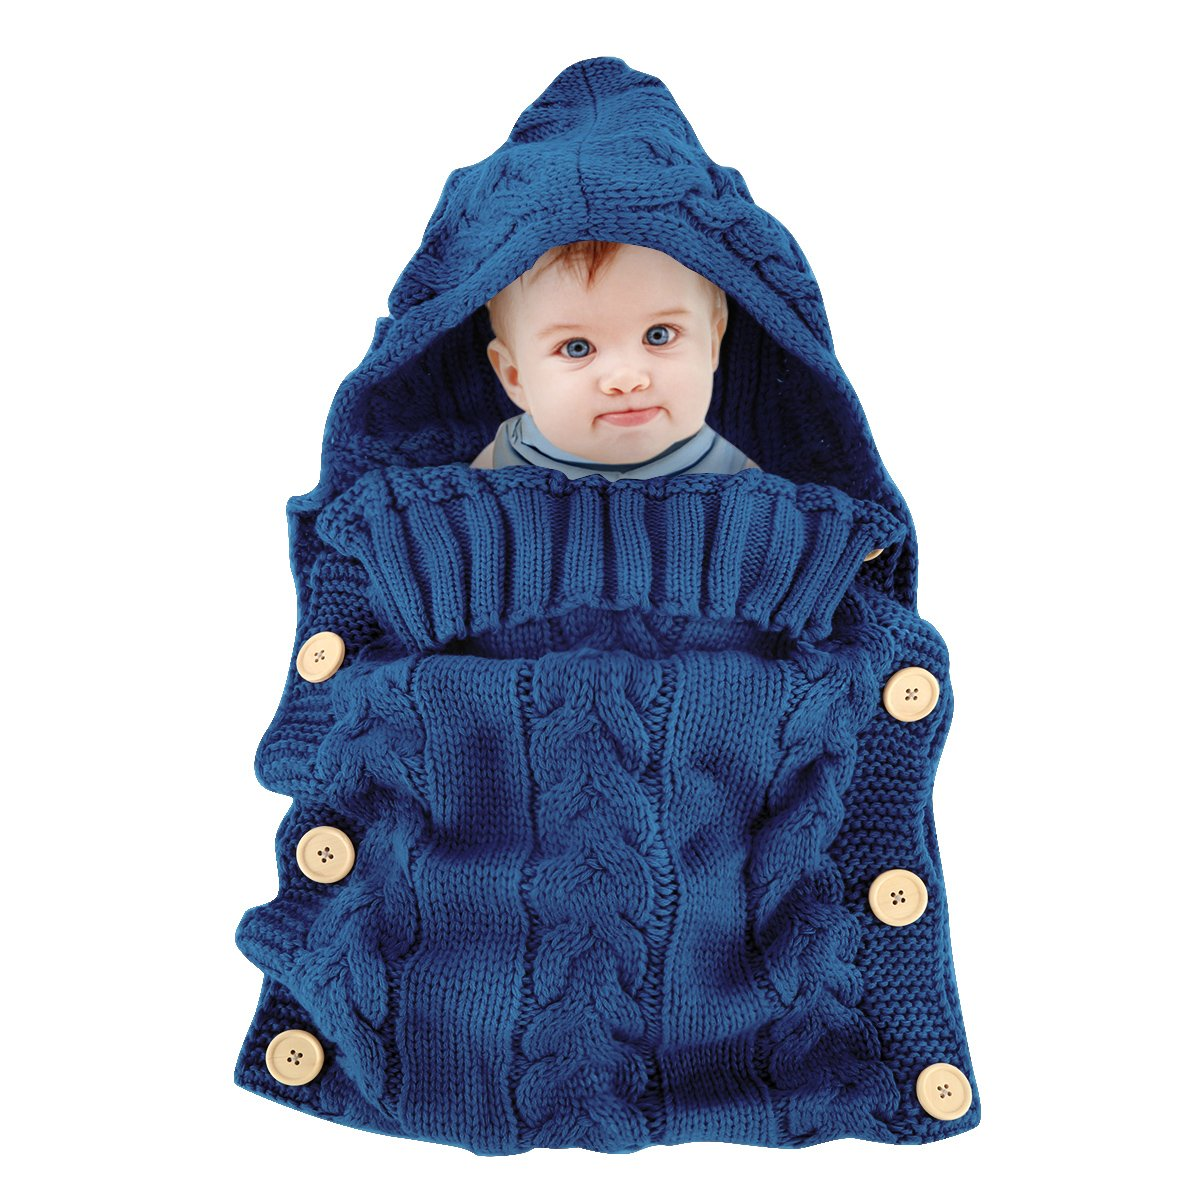 Colorful Newborn Baby Wrap Swaddle Blanket, Oenbopo Baby Kids Toddler Knit Blanket Swaddle Sleeping Bag Sleep Sack Stroller Wrap for 0-12 Month Baby (Blue)